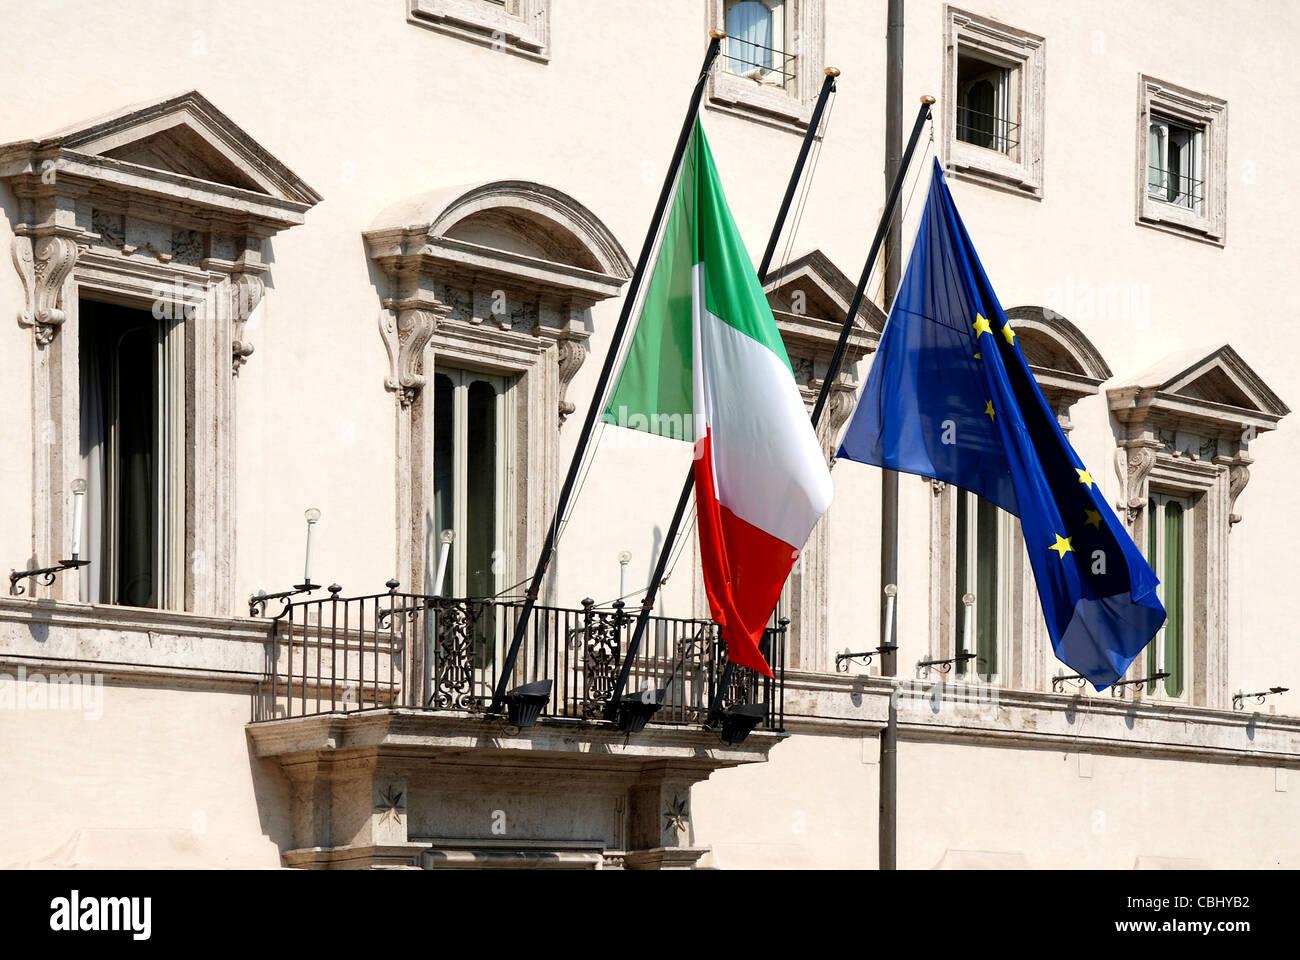 Palazzo Chigi in Rome - Residence of the Italian Prime Minister. Stock Photo